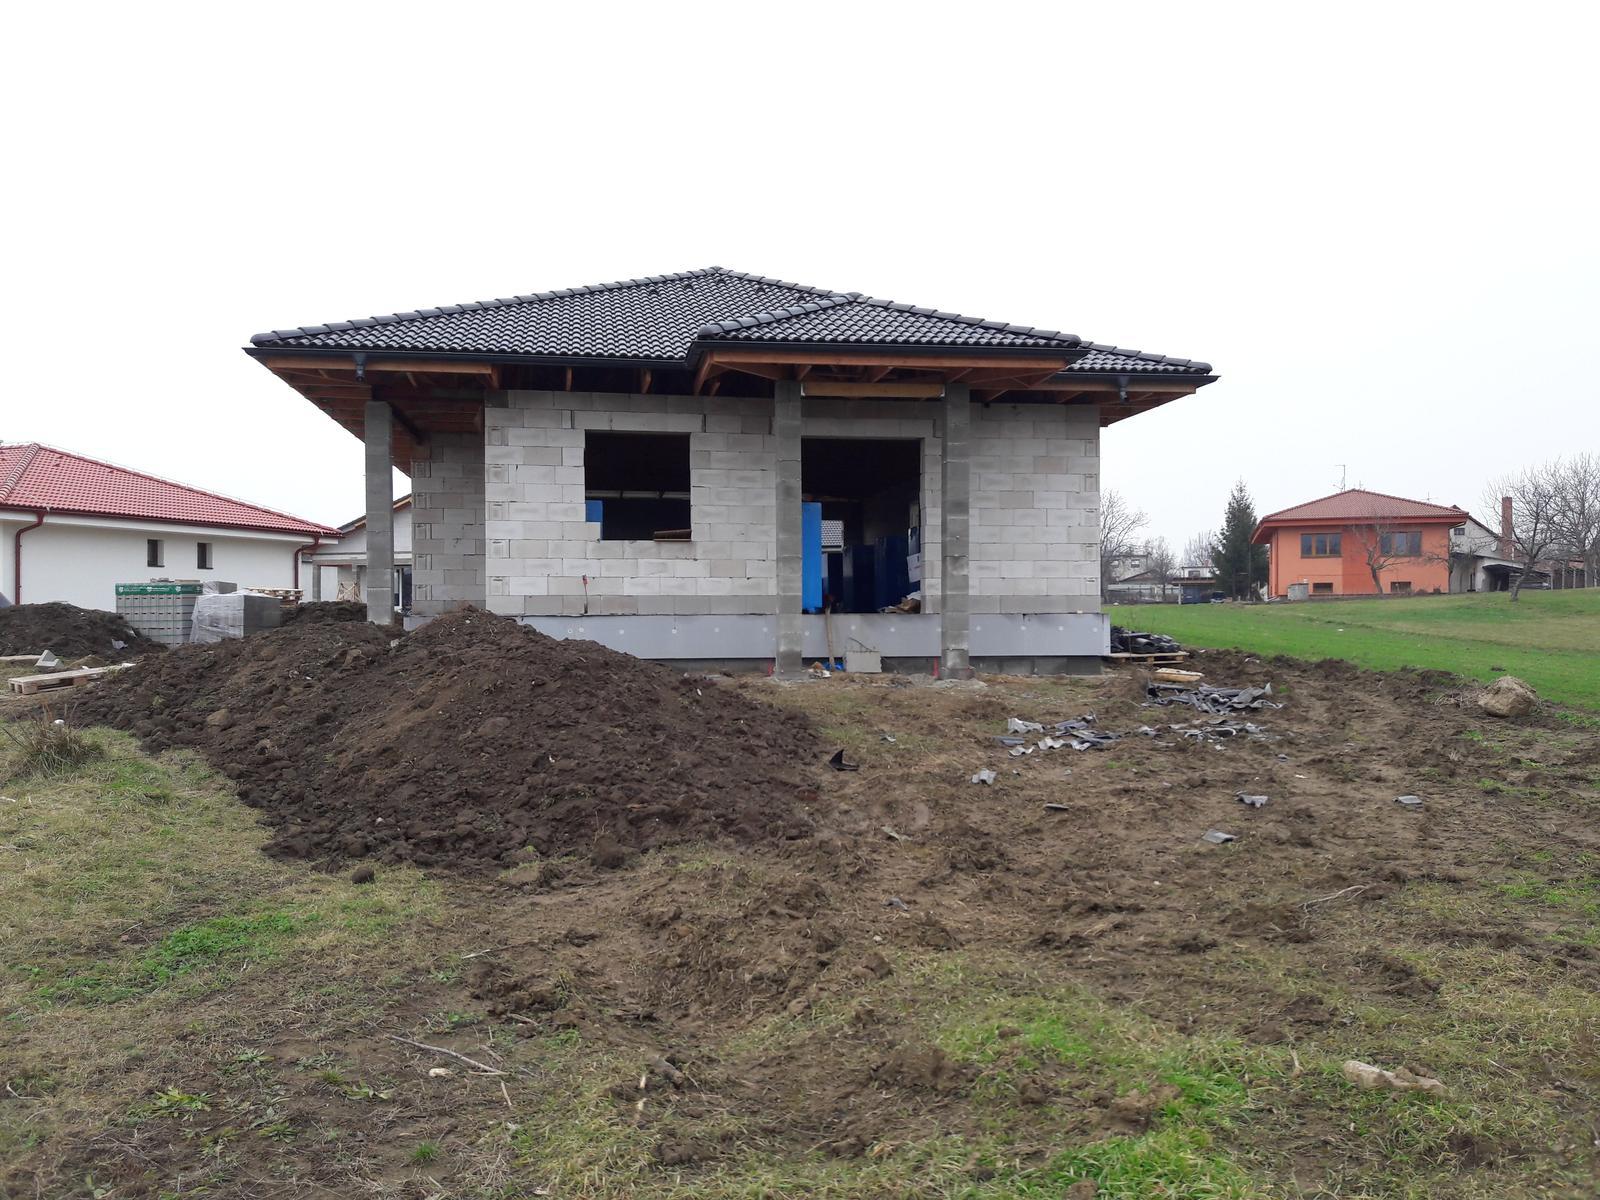 Zaciname stavat nas sen - moja vysnivana strieska nad vchodom :-)